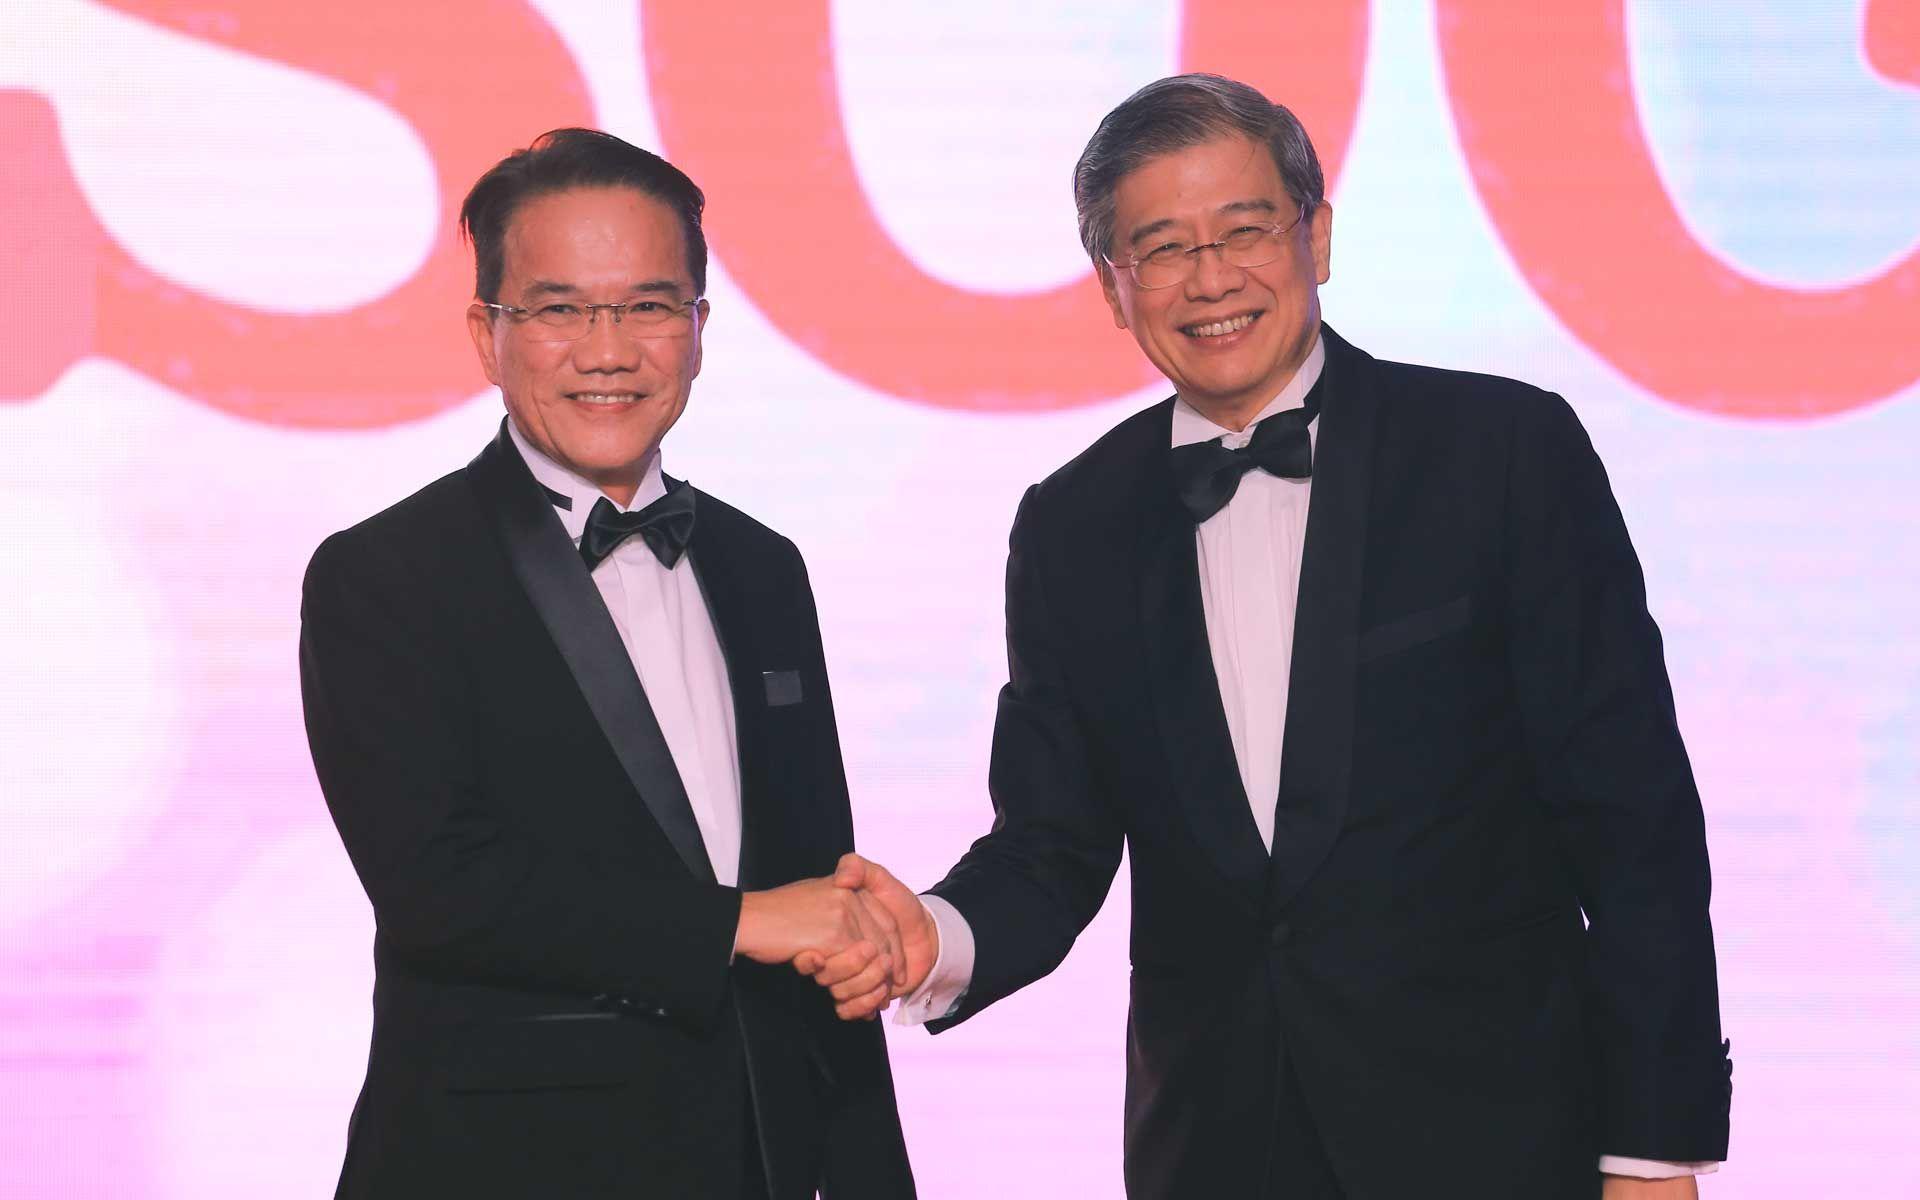 Datuk Liew Vui Keong and Datuk Andrew Lim